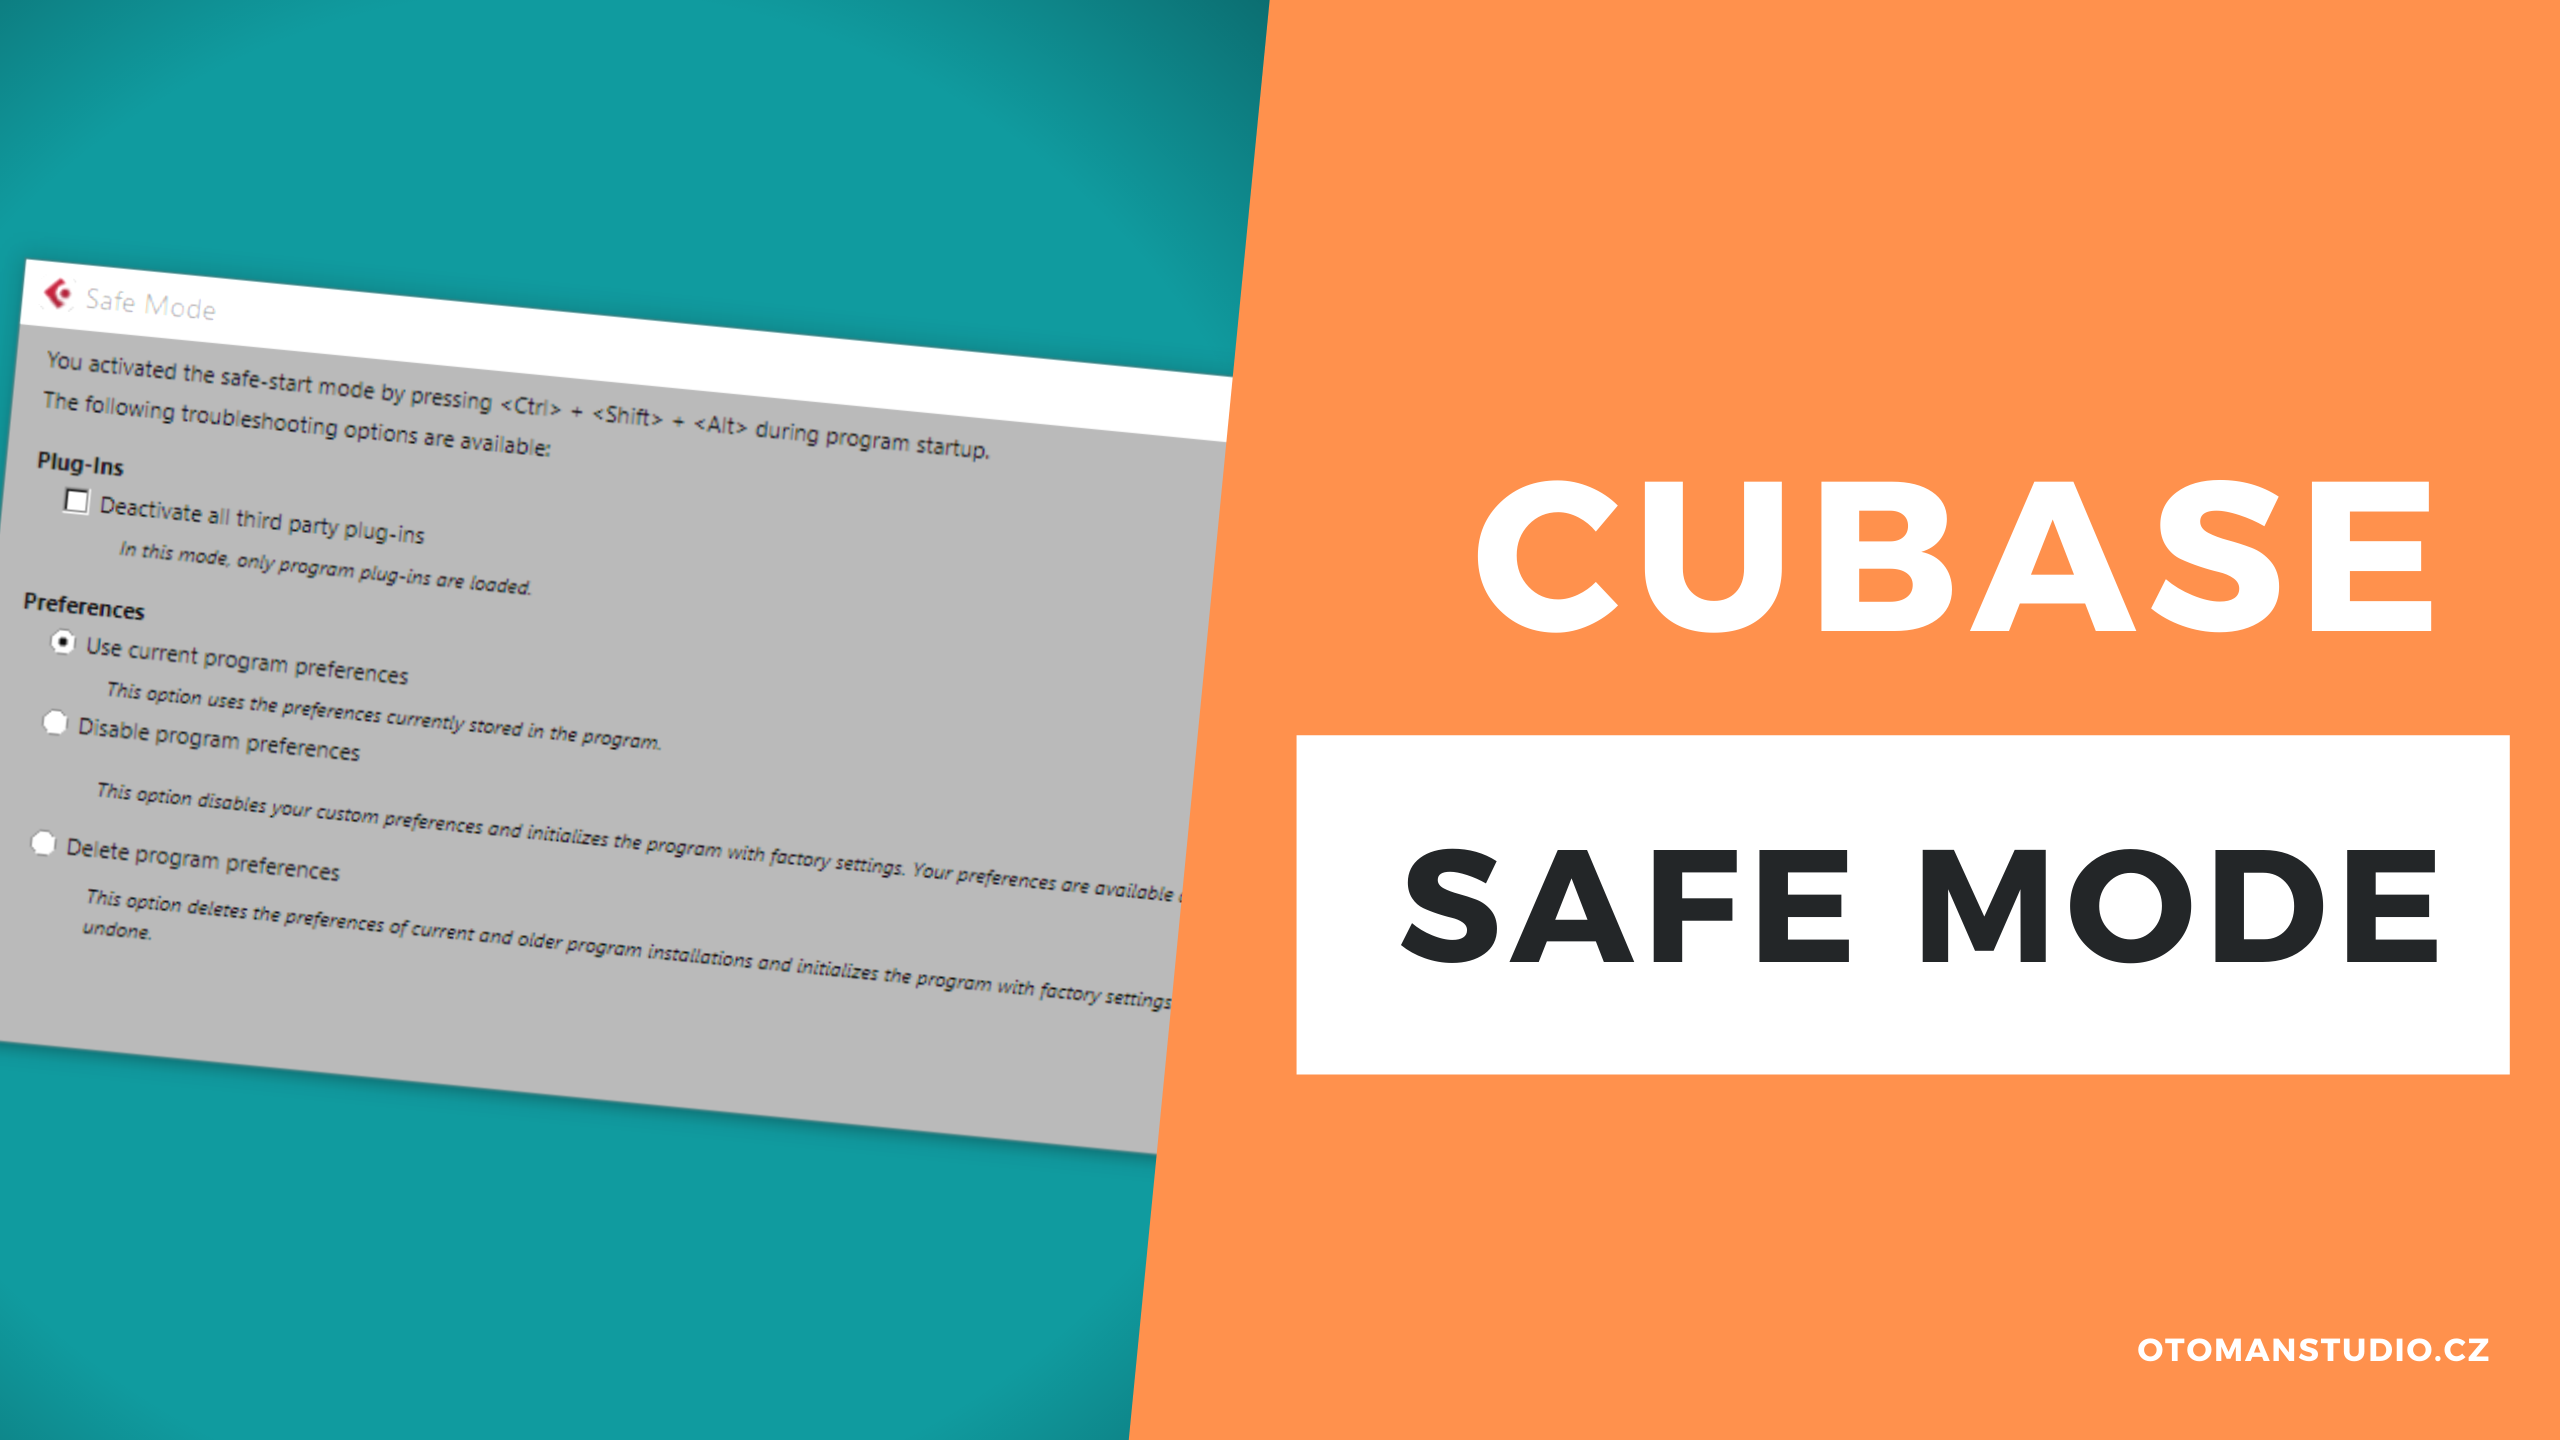 Cubase – Safe mode